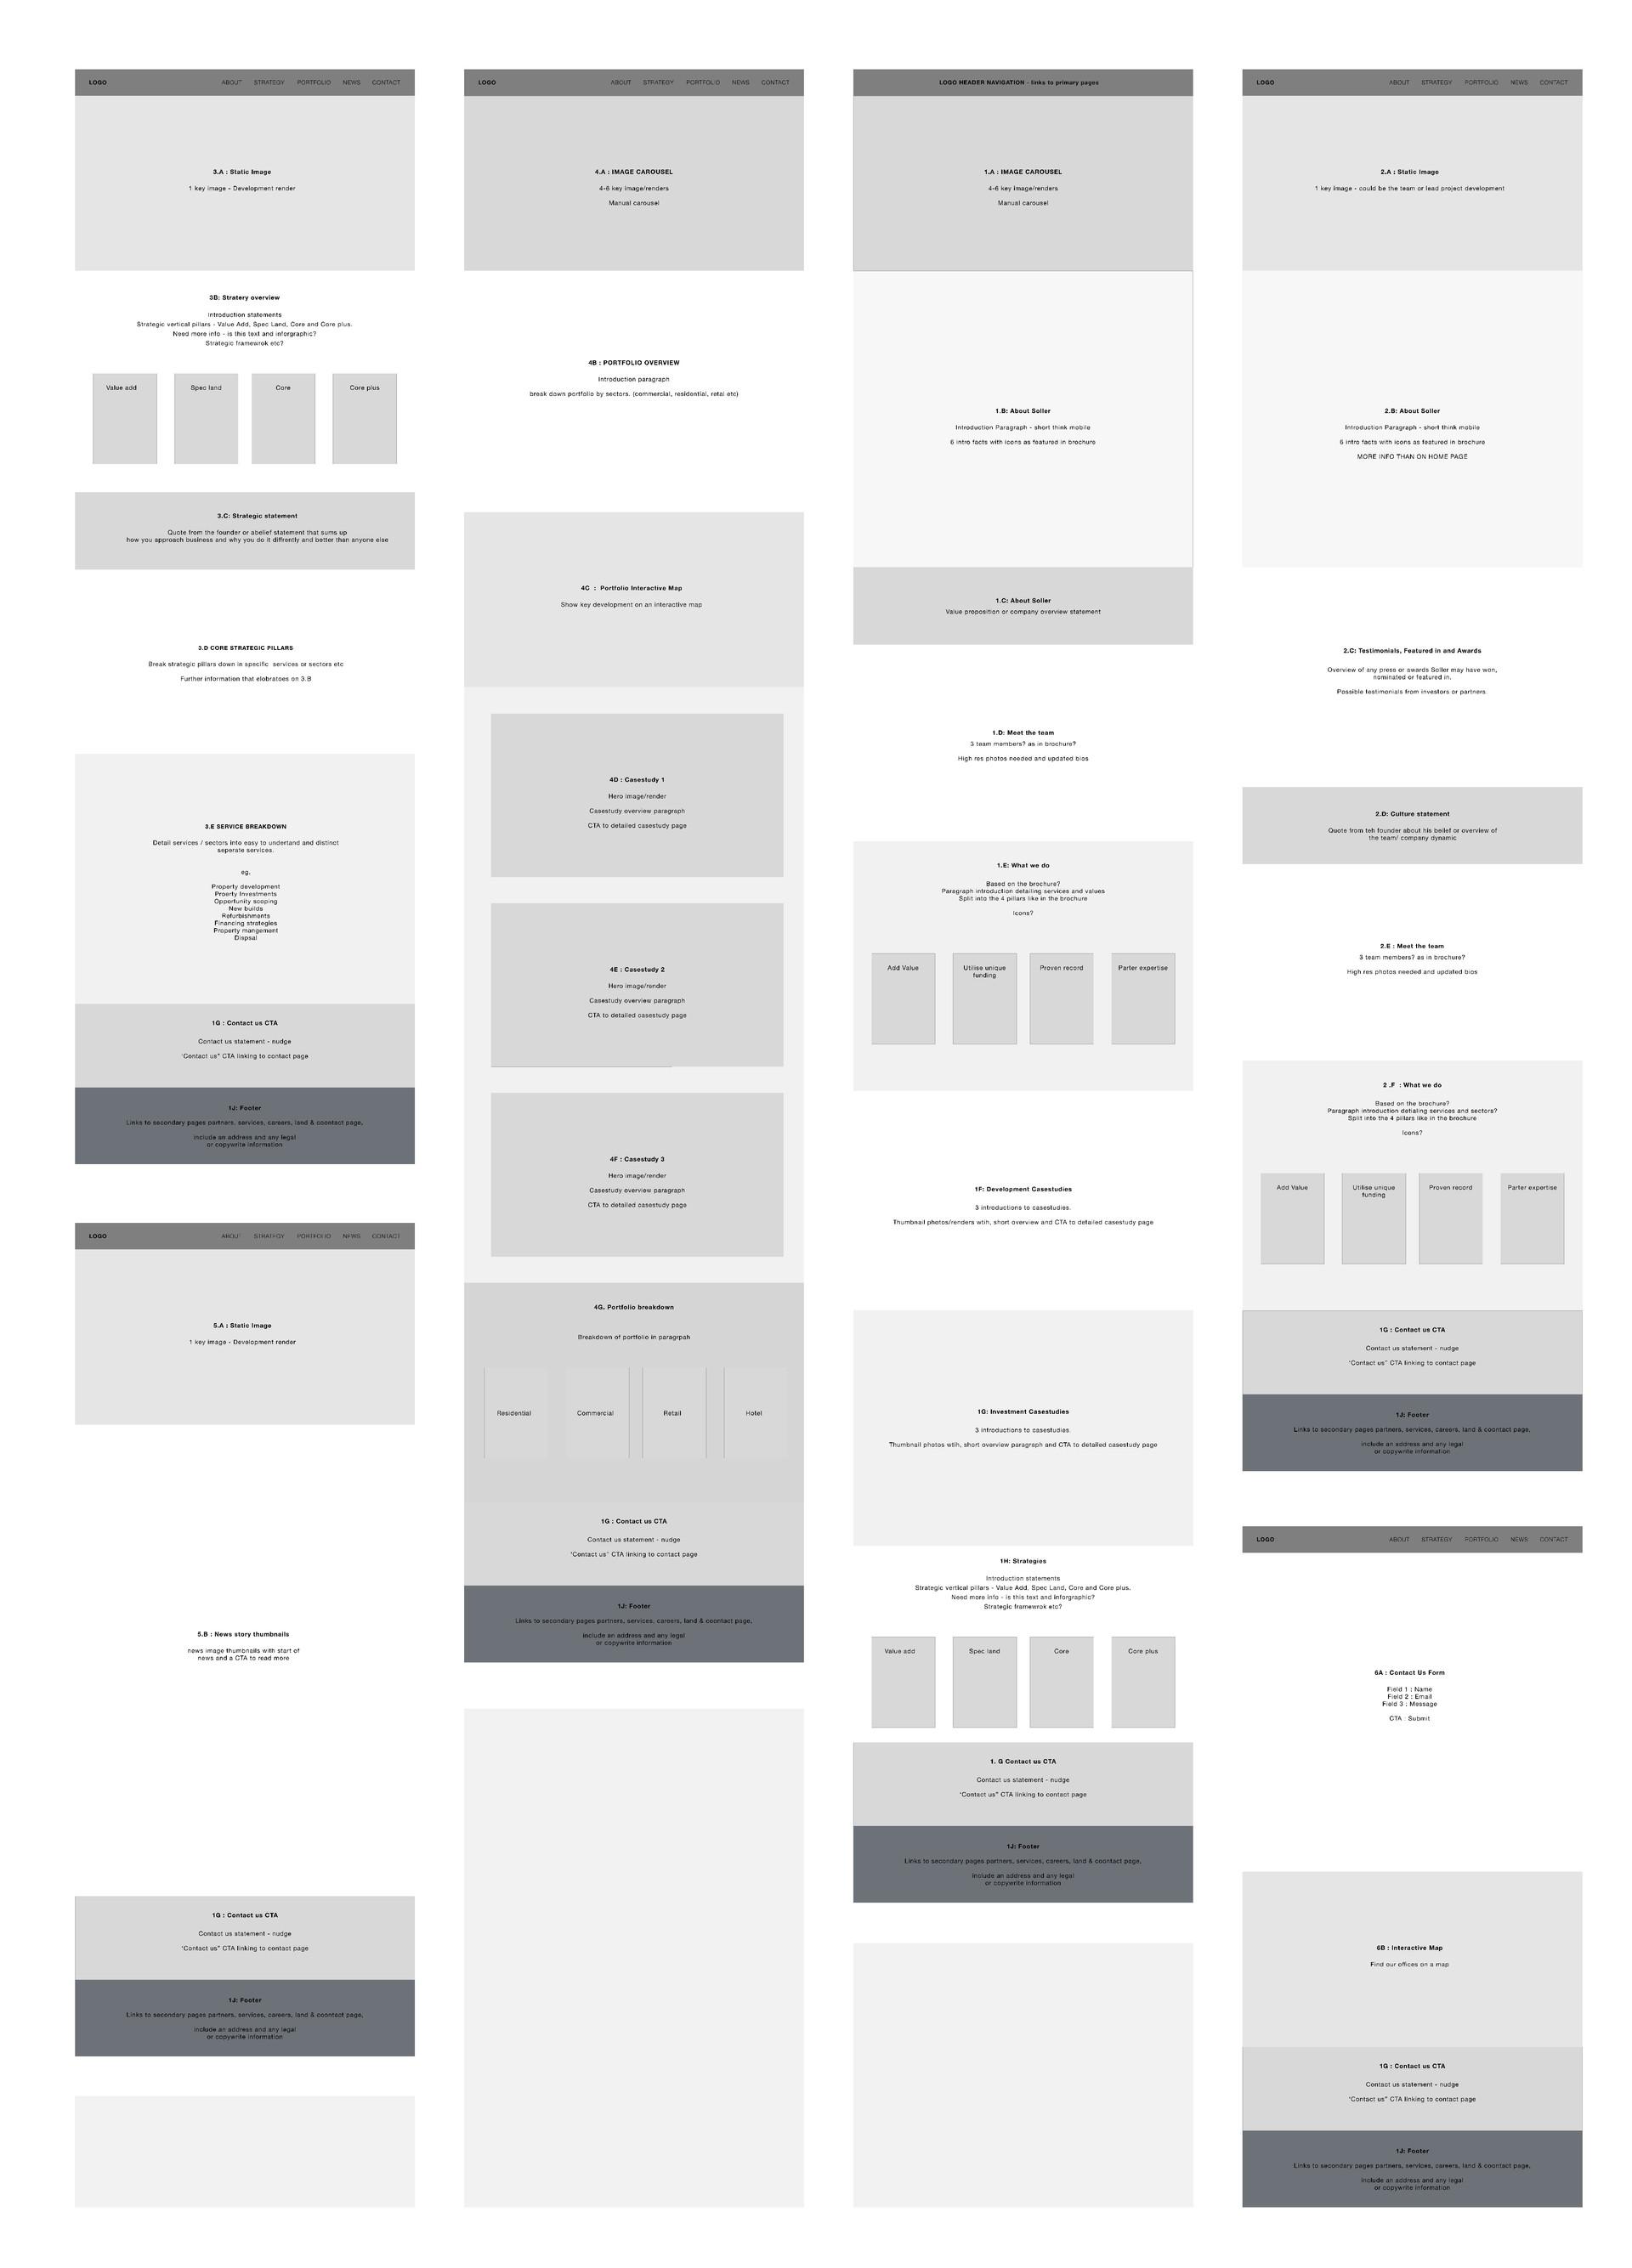 Soller Casesudy Assets copy-01.jpg